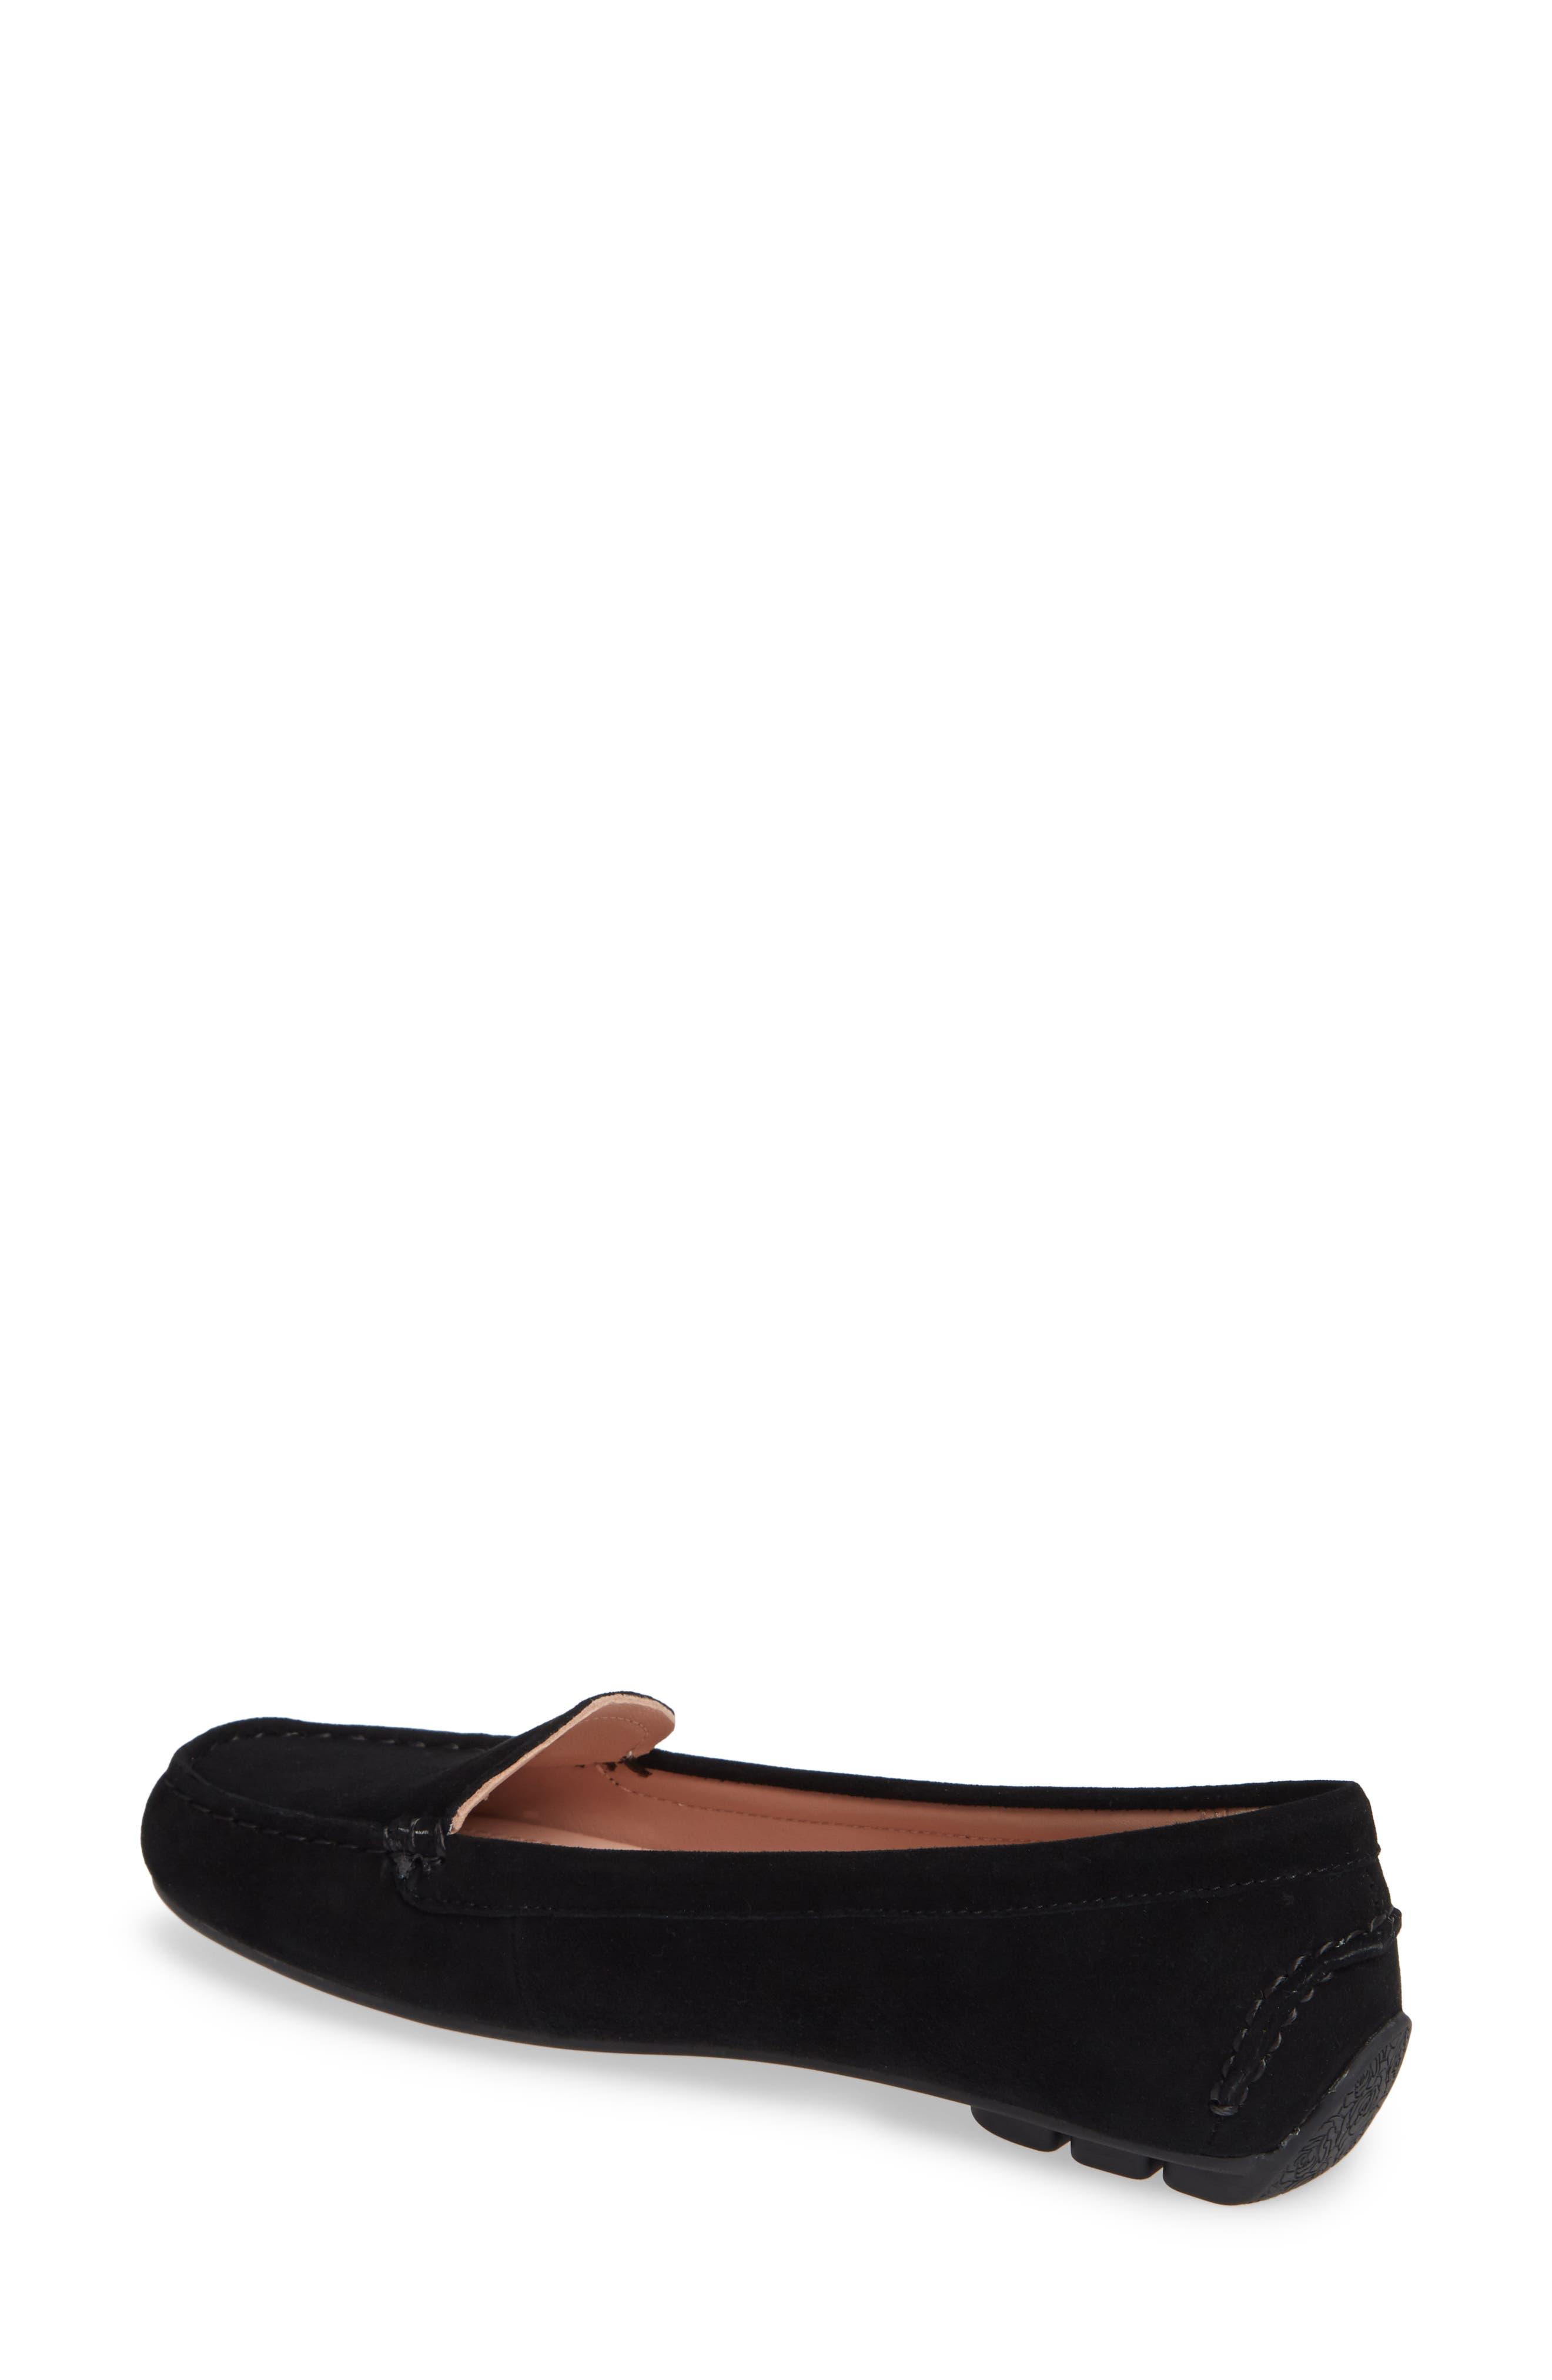 TARYN ROSE, Karen Water Resistant Driving Loafer, Alternate thumbnail 2, color, BLACK SUEDE